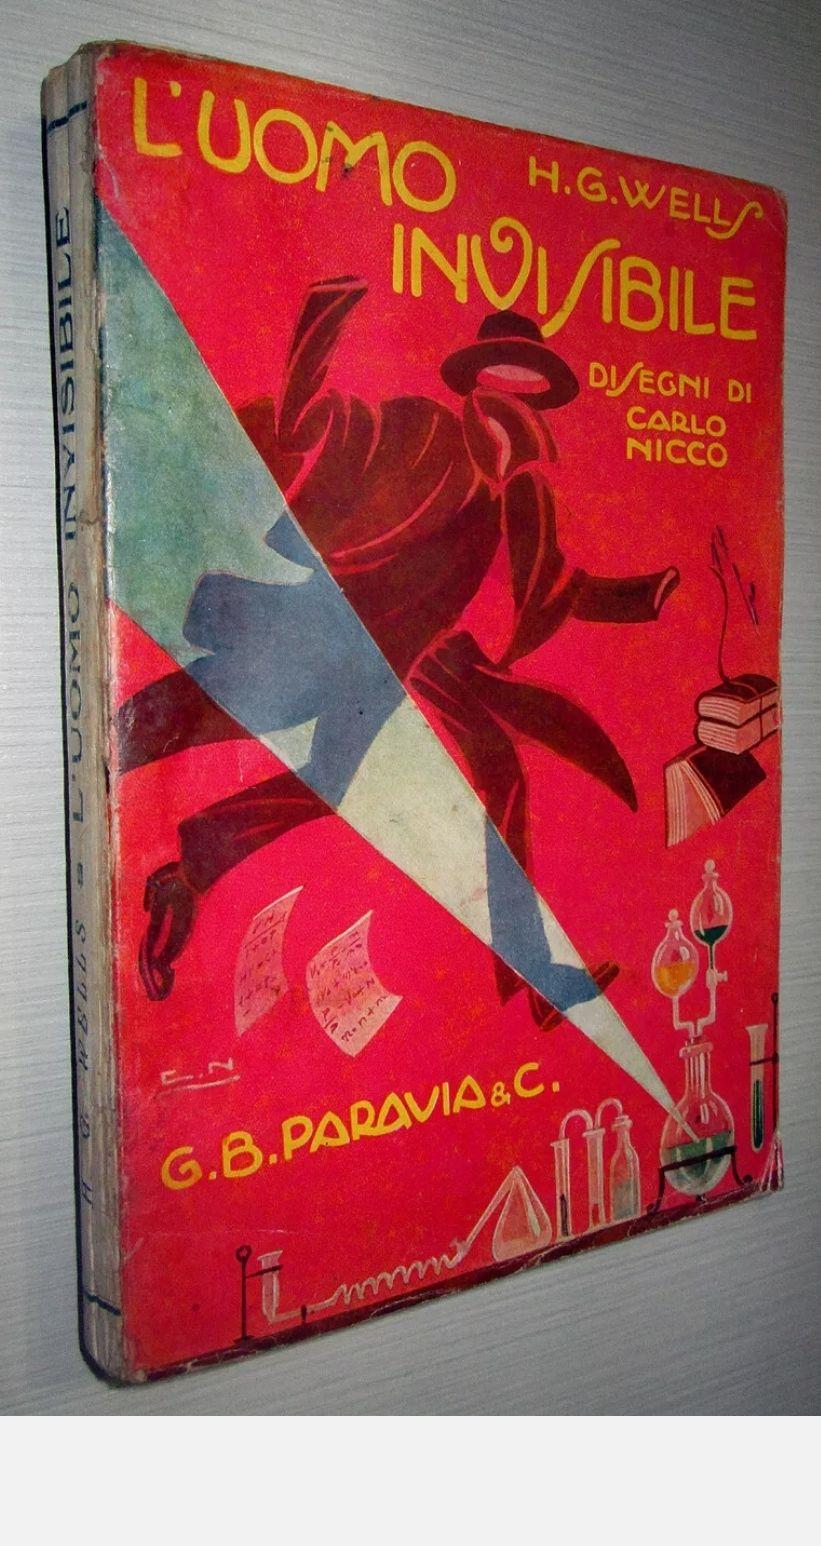 L'UOMO INVISIBILE (Ed. G.B. Paravia & C. – 1925) – Herbert George Wells. A 49 €